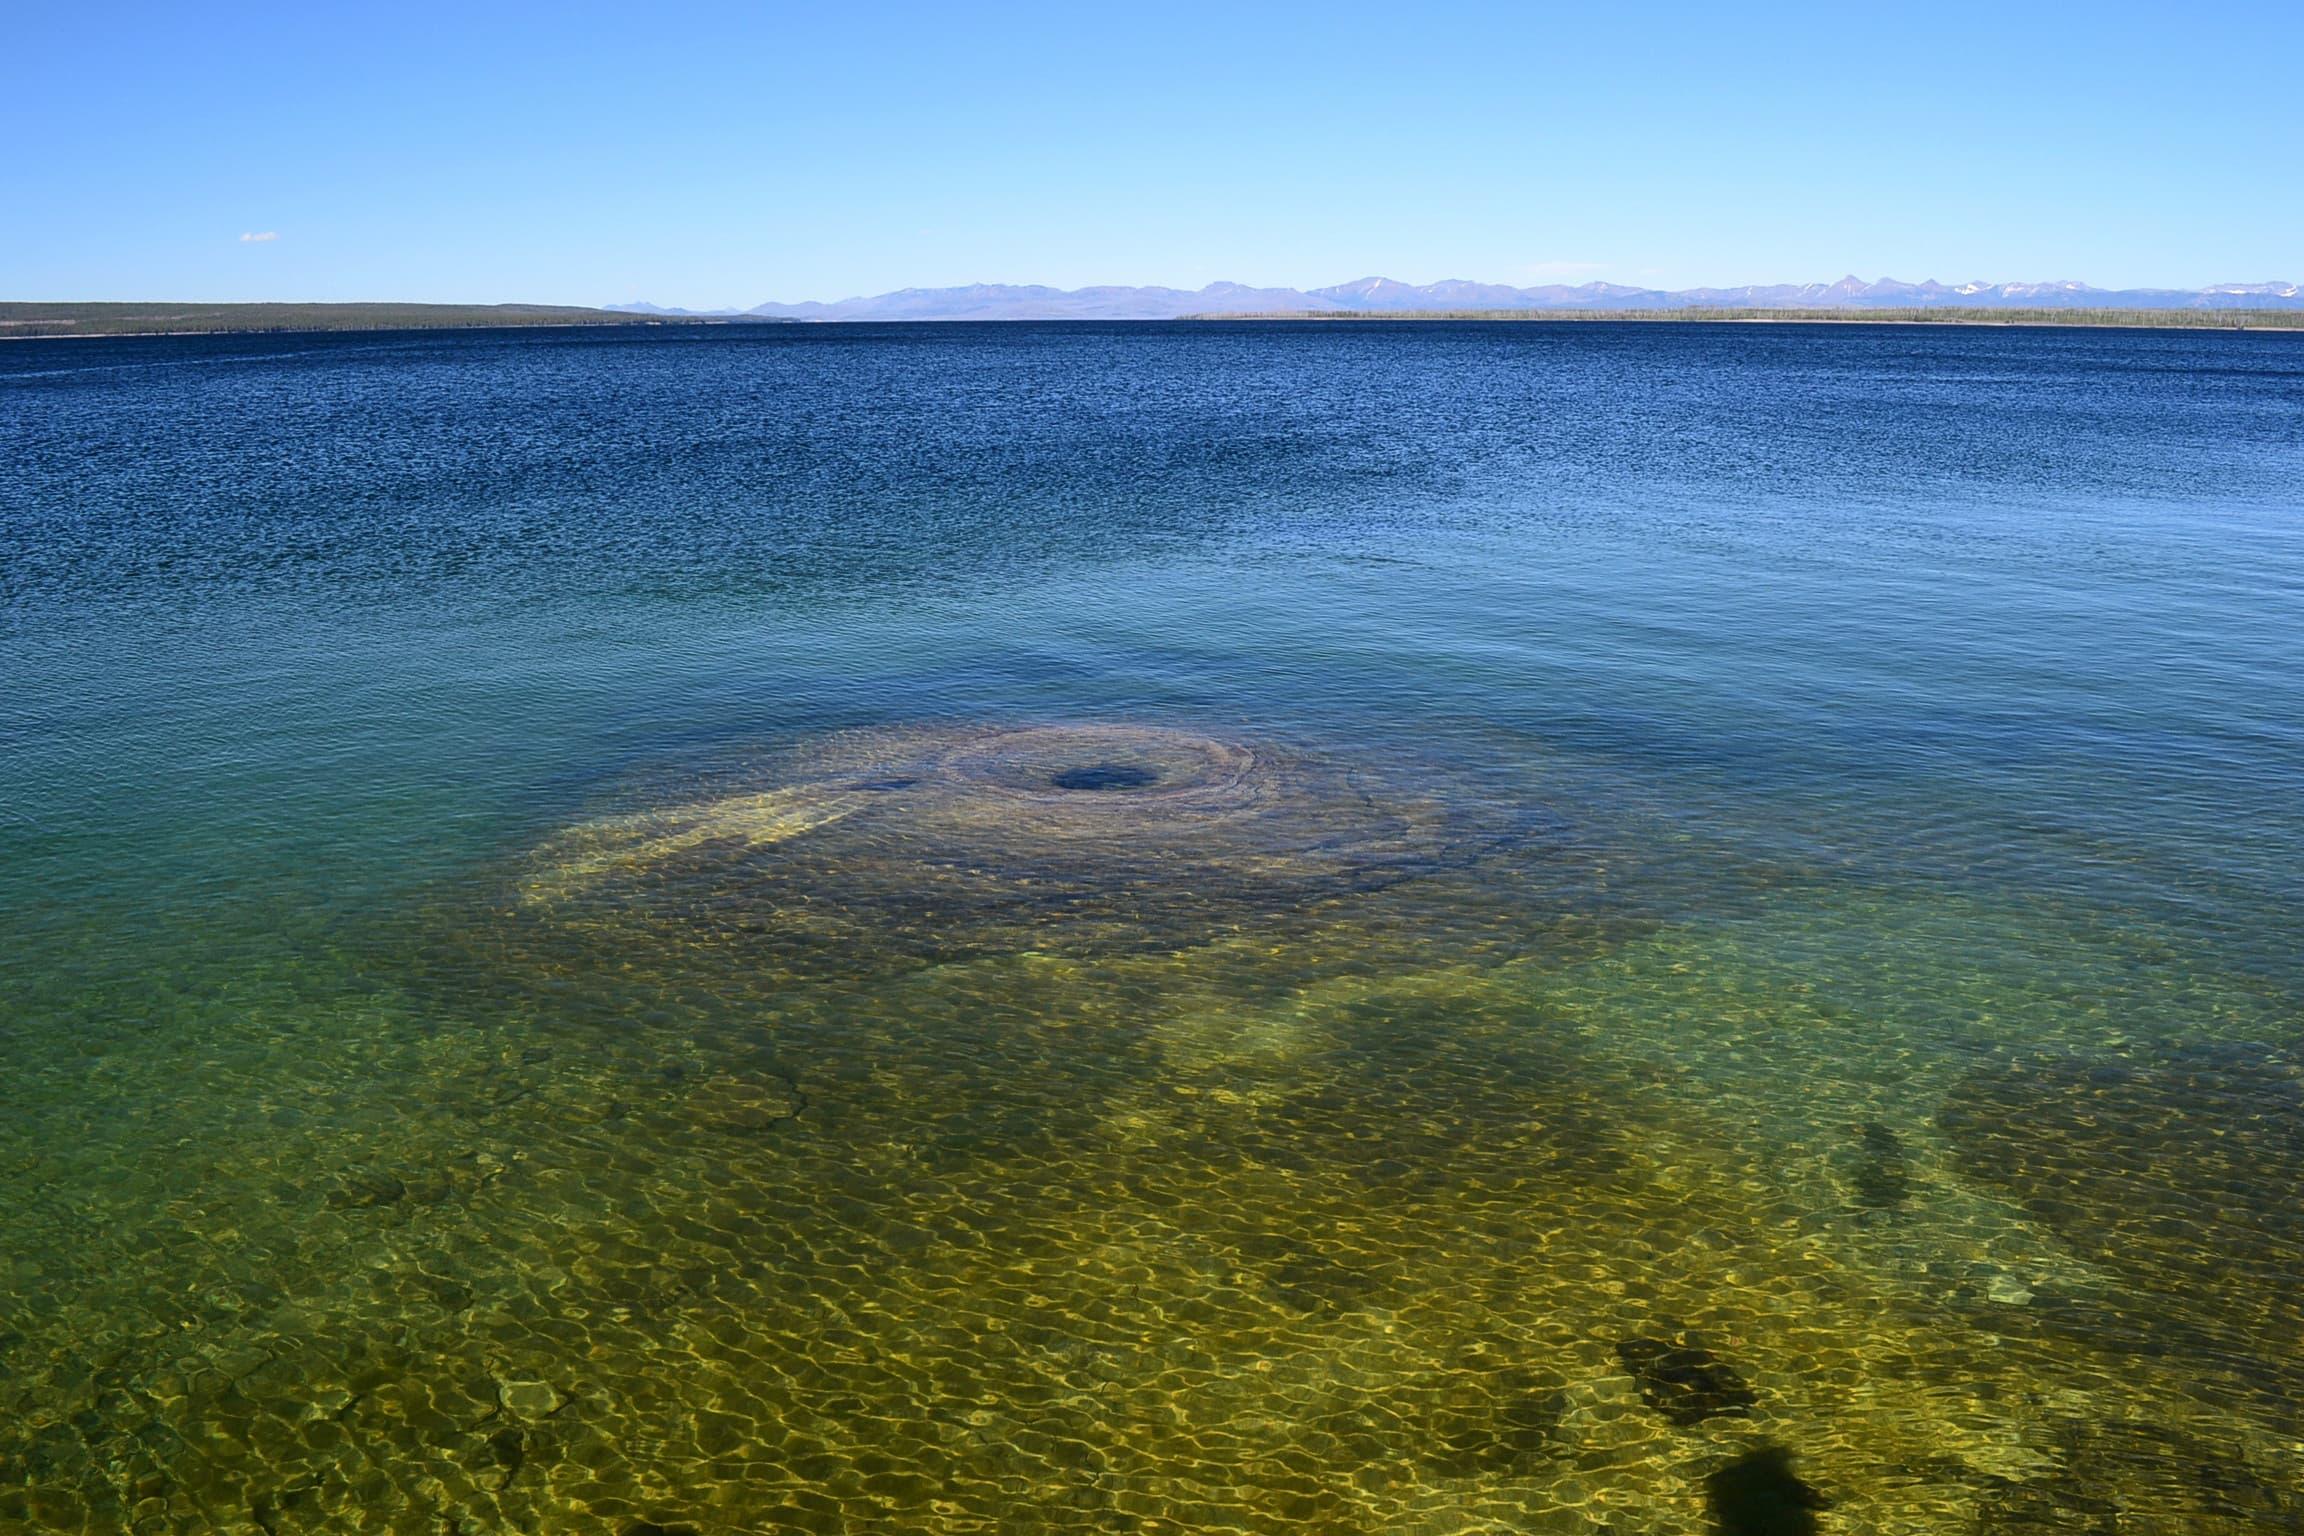 Hot spring in Yellowstone lake.